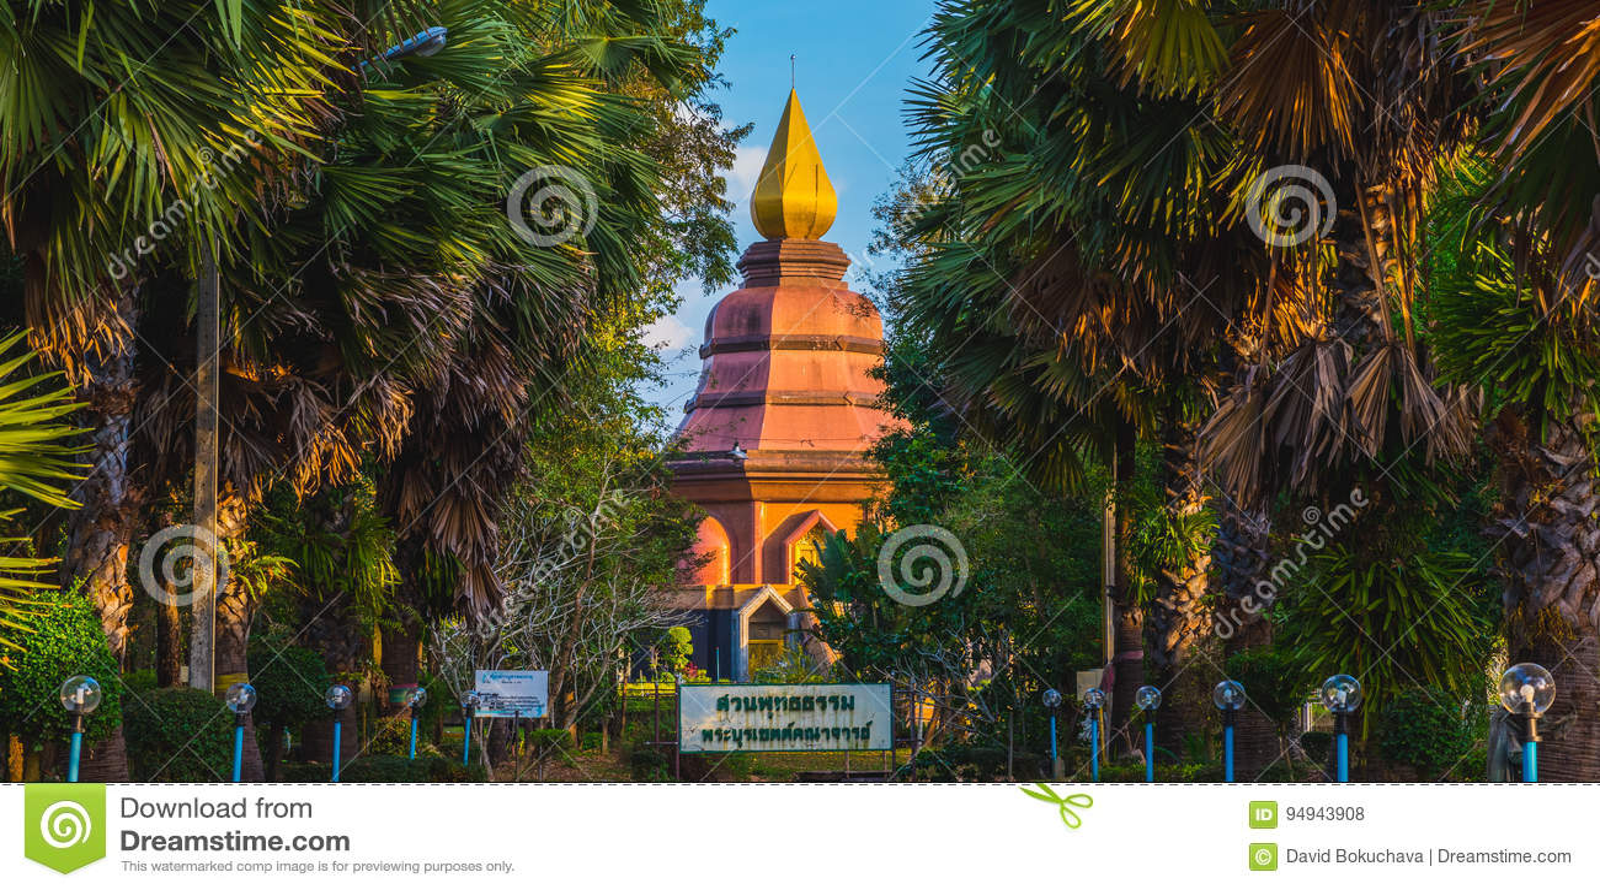 Trat, Thailand: Buddhist temple